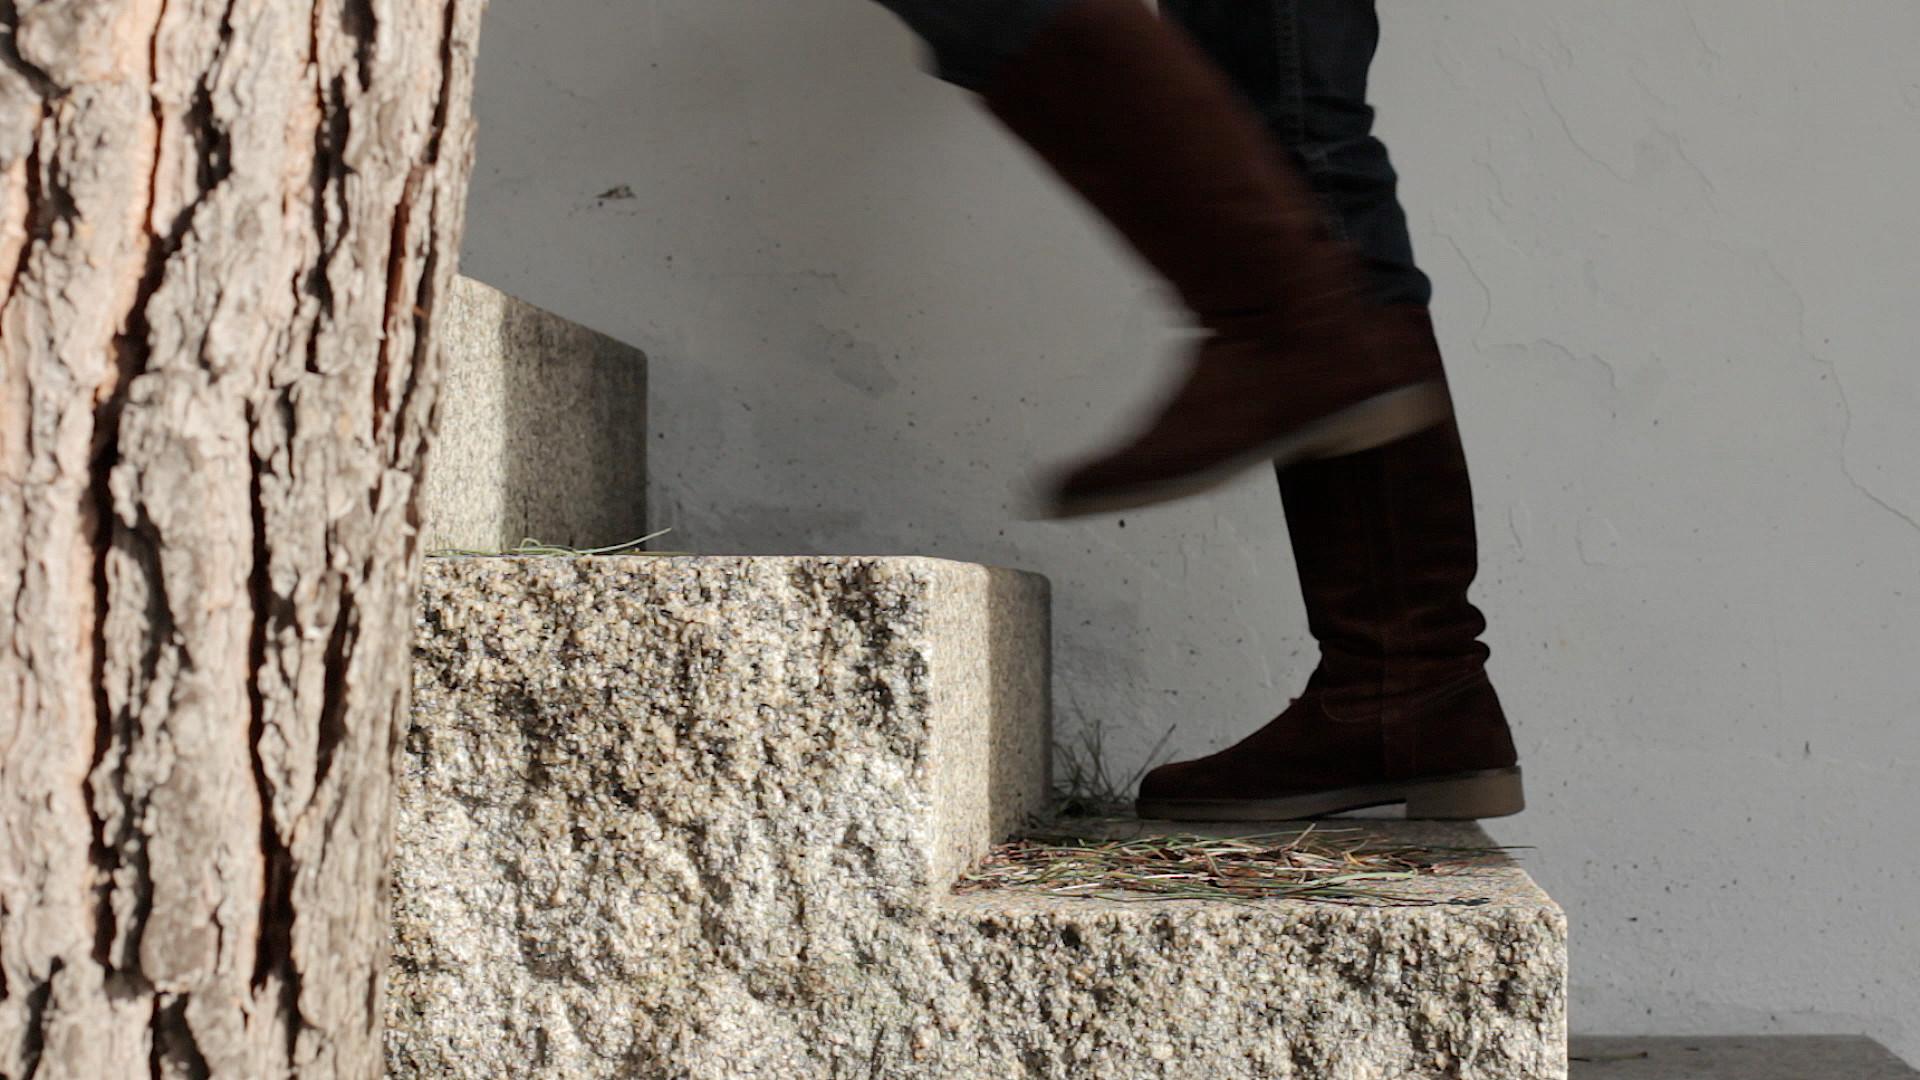 Arquitectura à Moda do Porto: Episodio 2 - Escaleras, Cortesía de Building Pictures, Filipa Figueira Arquitectura y Tiago Vieira Arquitecto